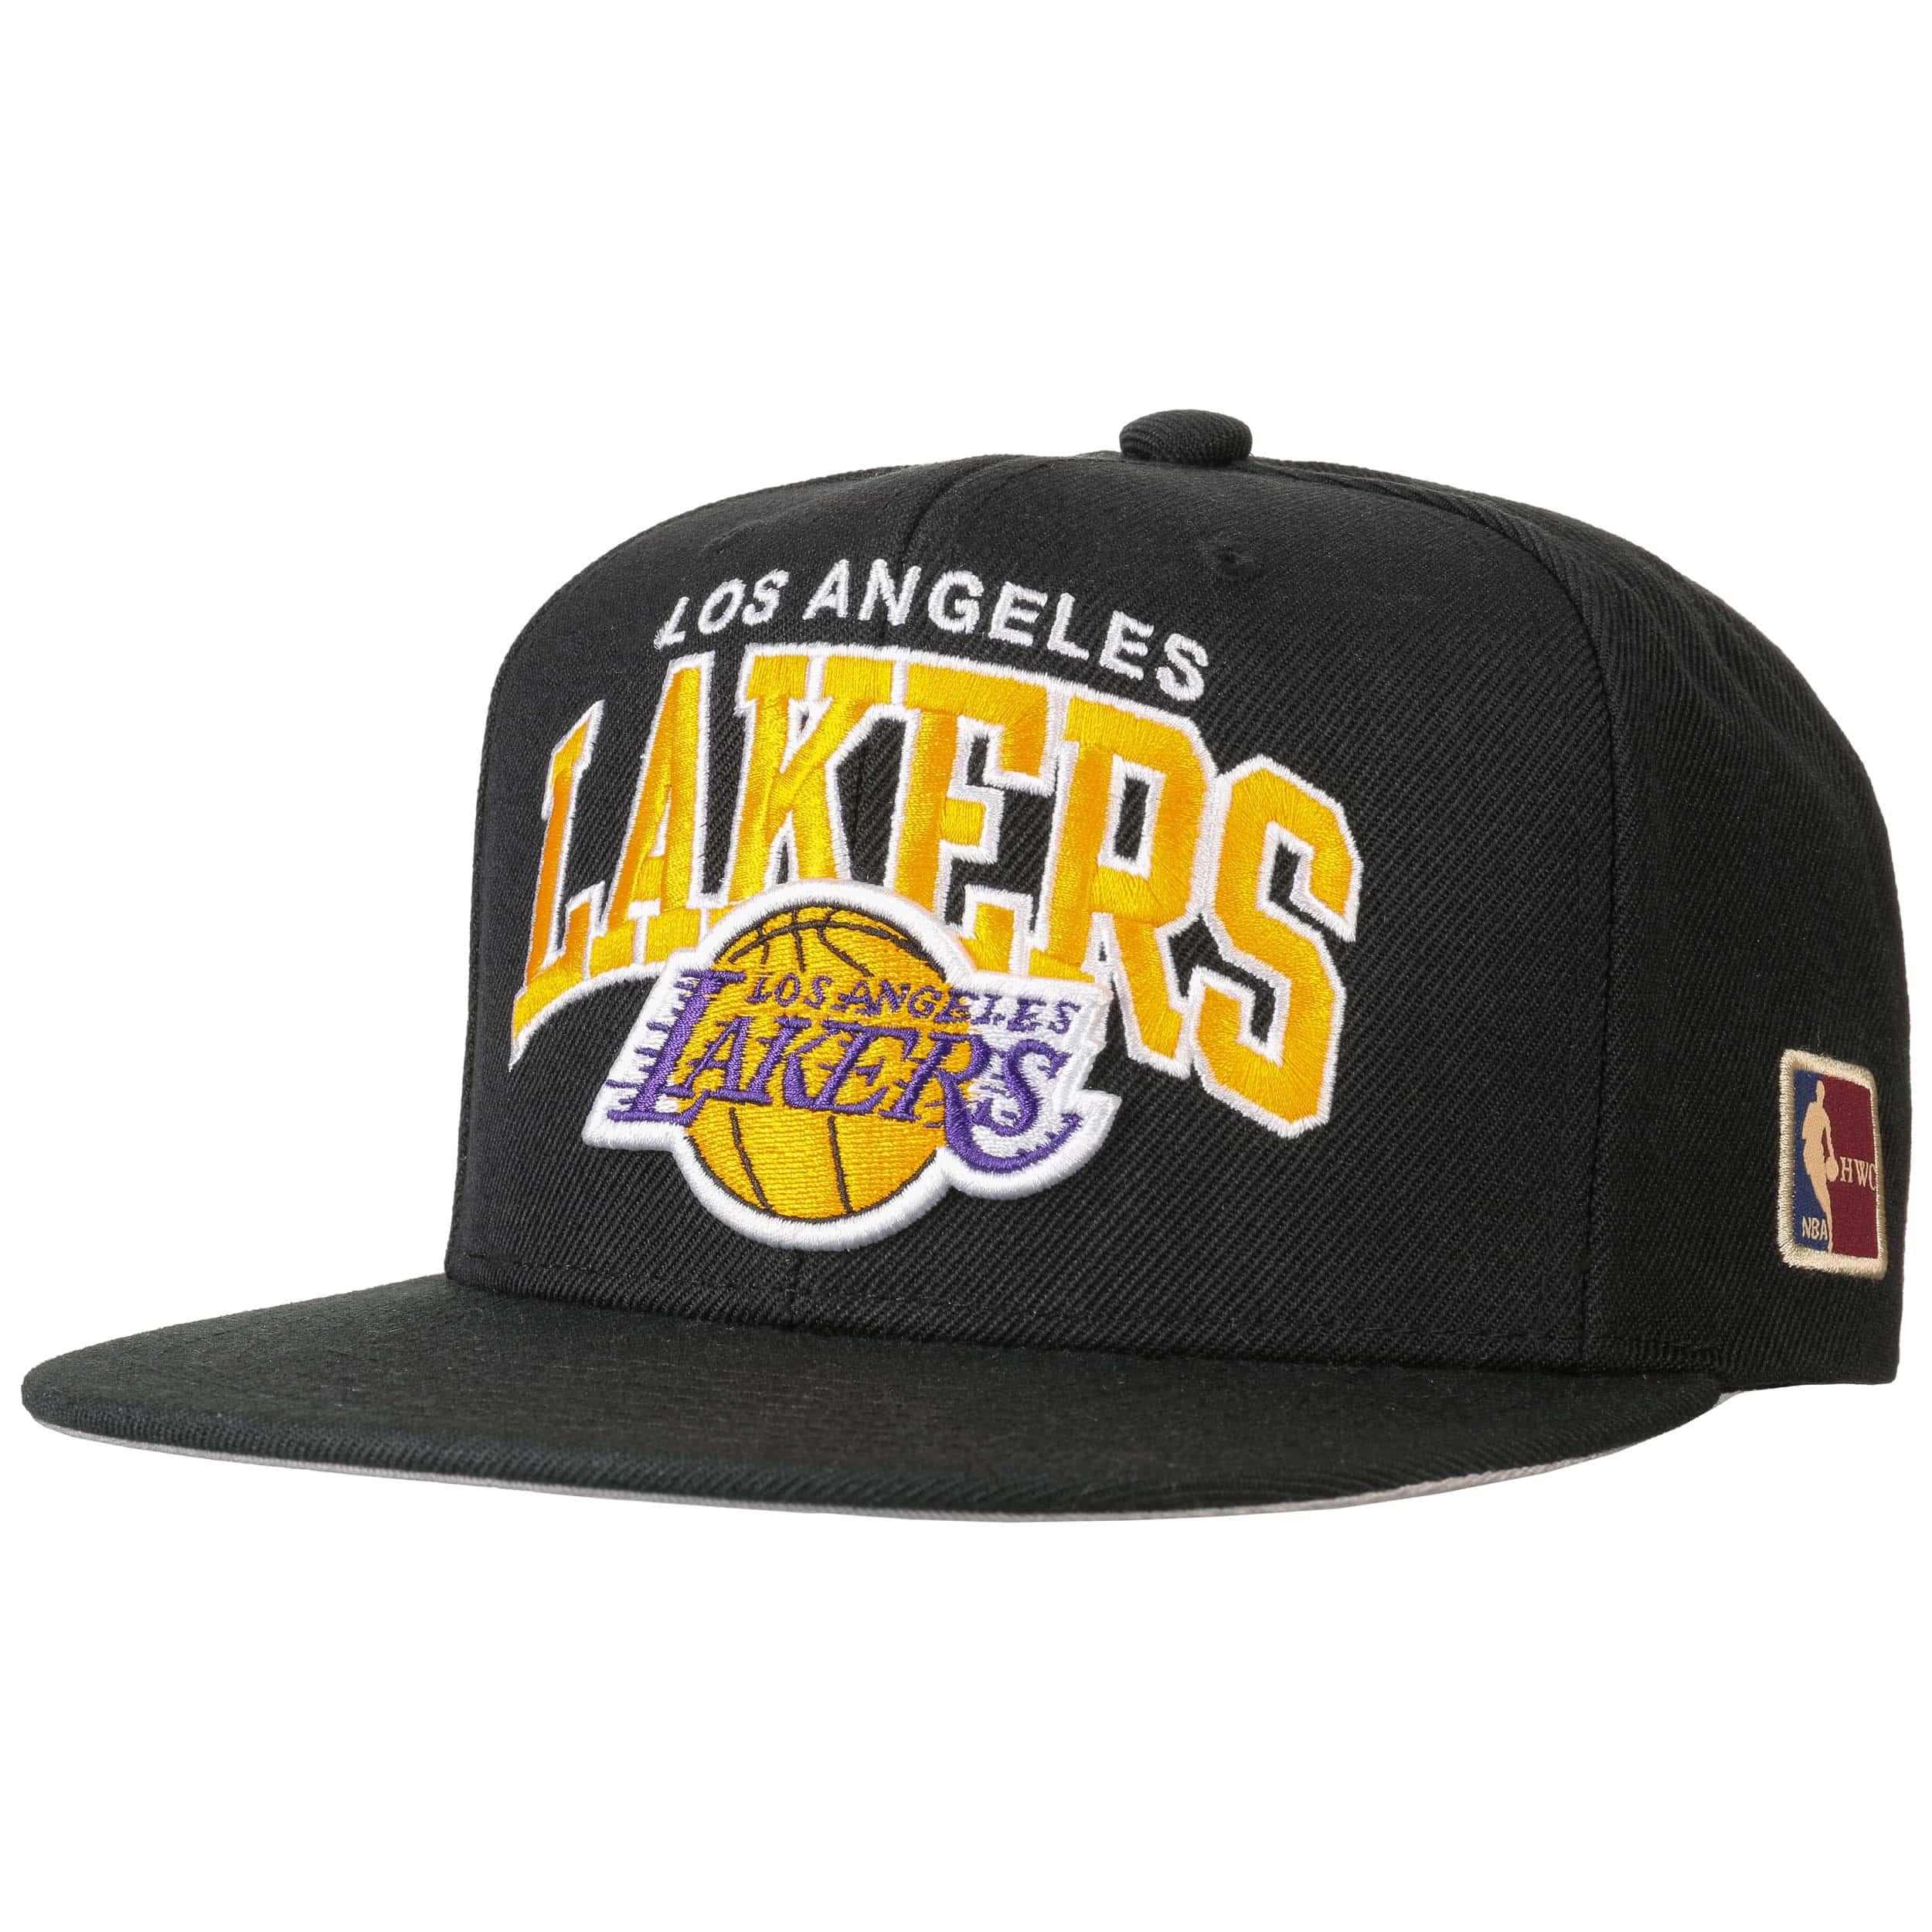 8fffe9e15ee18 Gorra HWC NBA Lakers by Mitchell   Ness - Gorras - sombreroshop.es